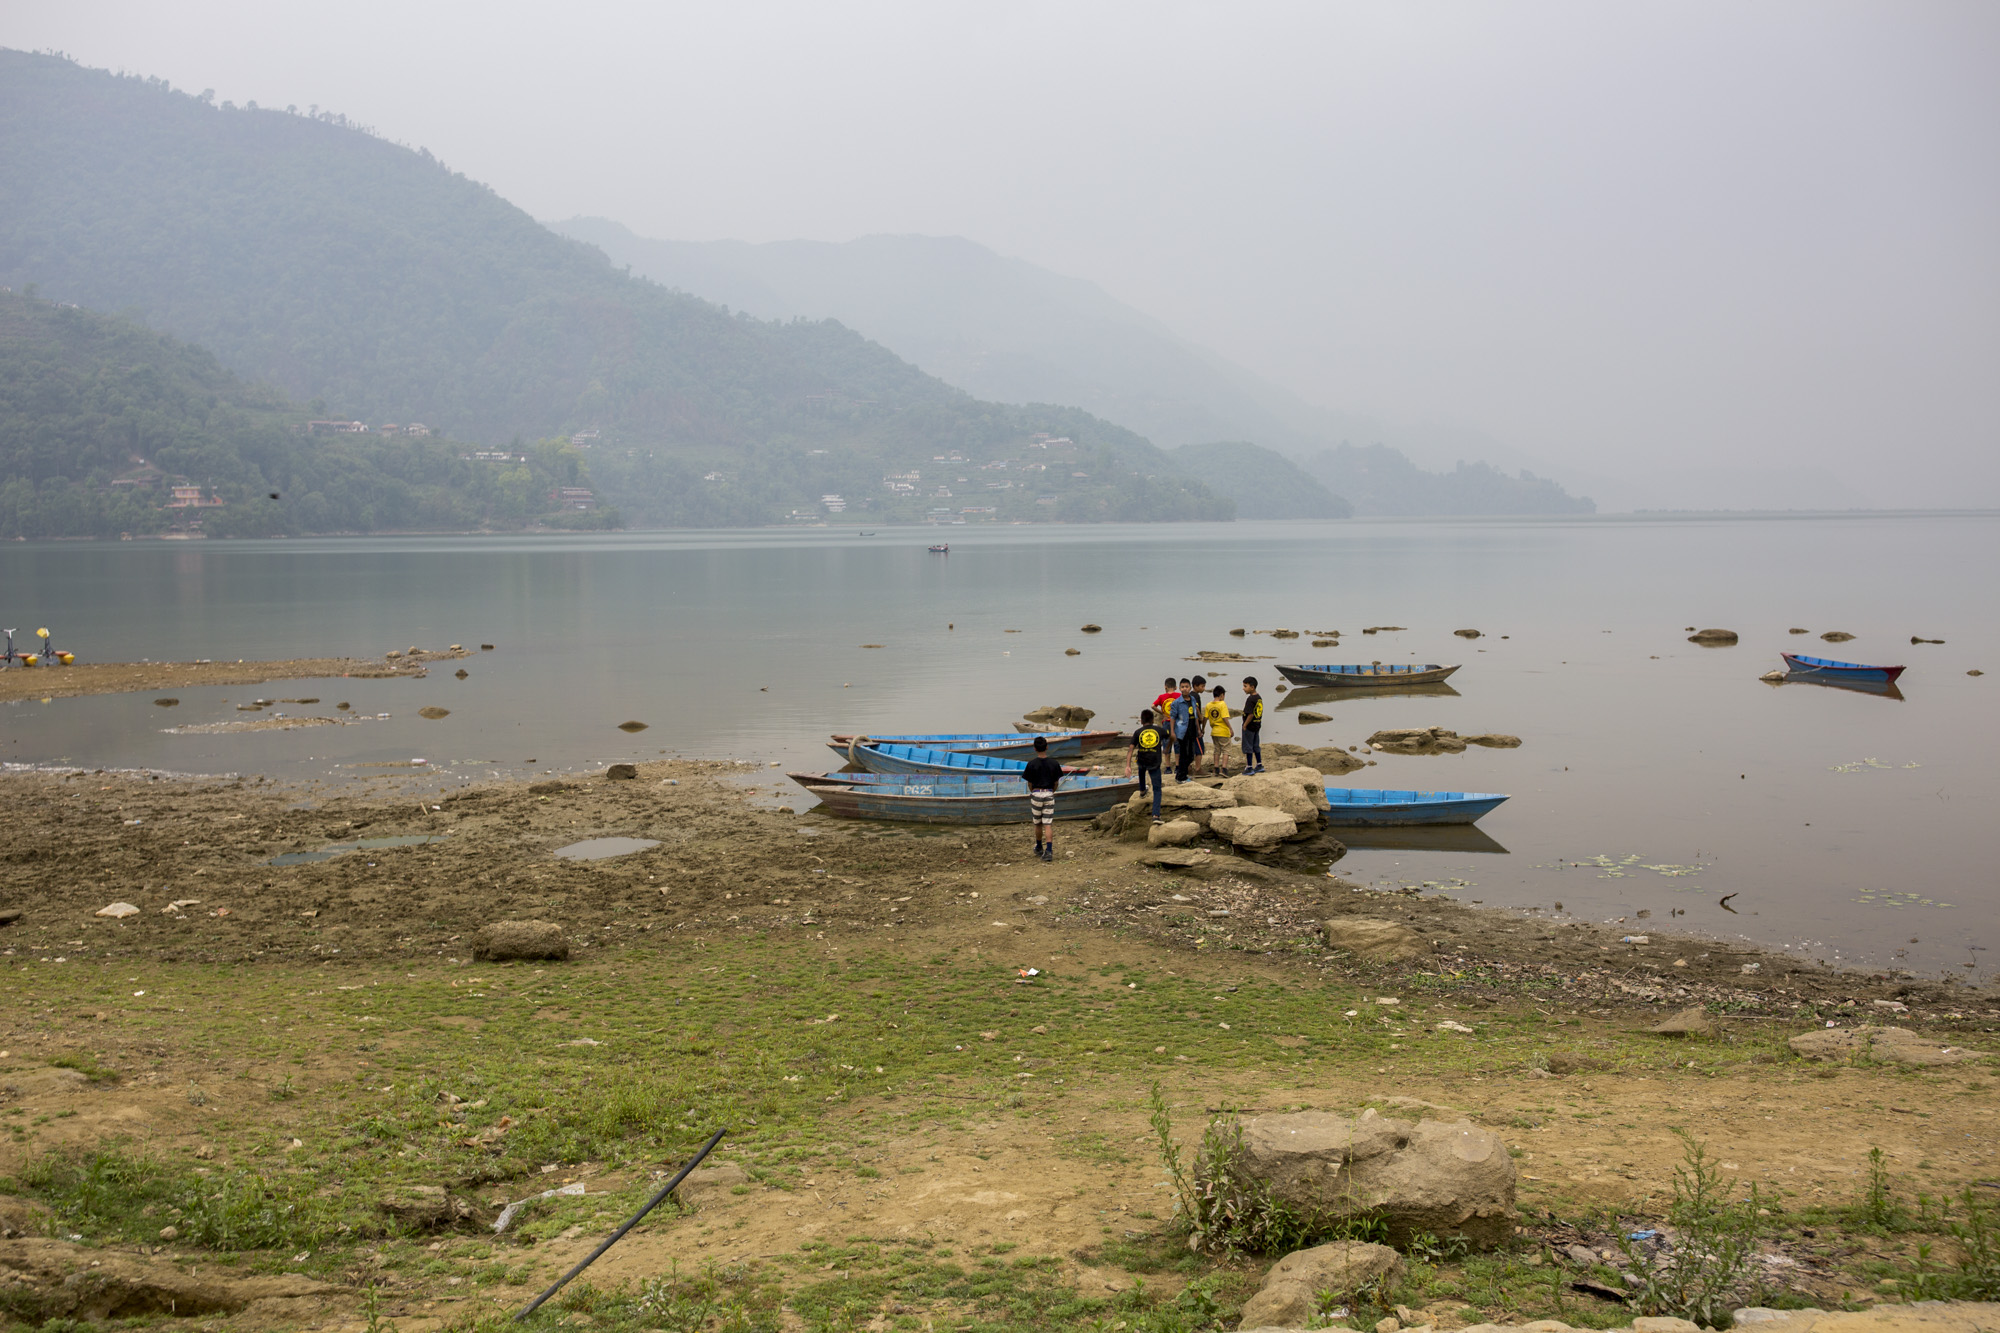 Dreaming in Pokhara